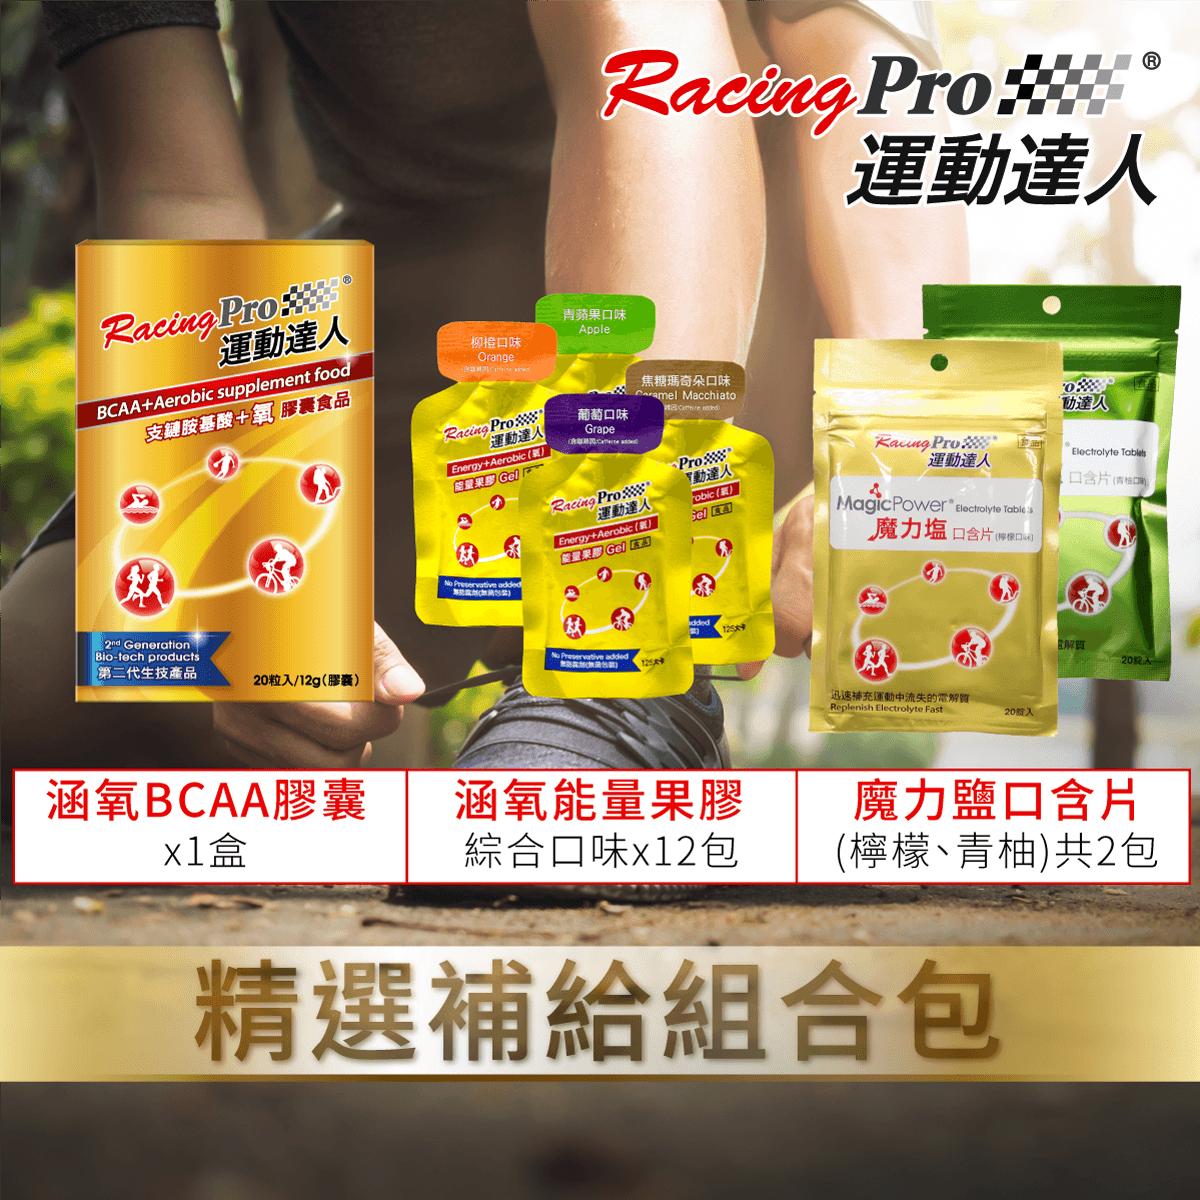 【RacingPro】【BCAA/能量果膠/魔力塩】精選補給組合包 0